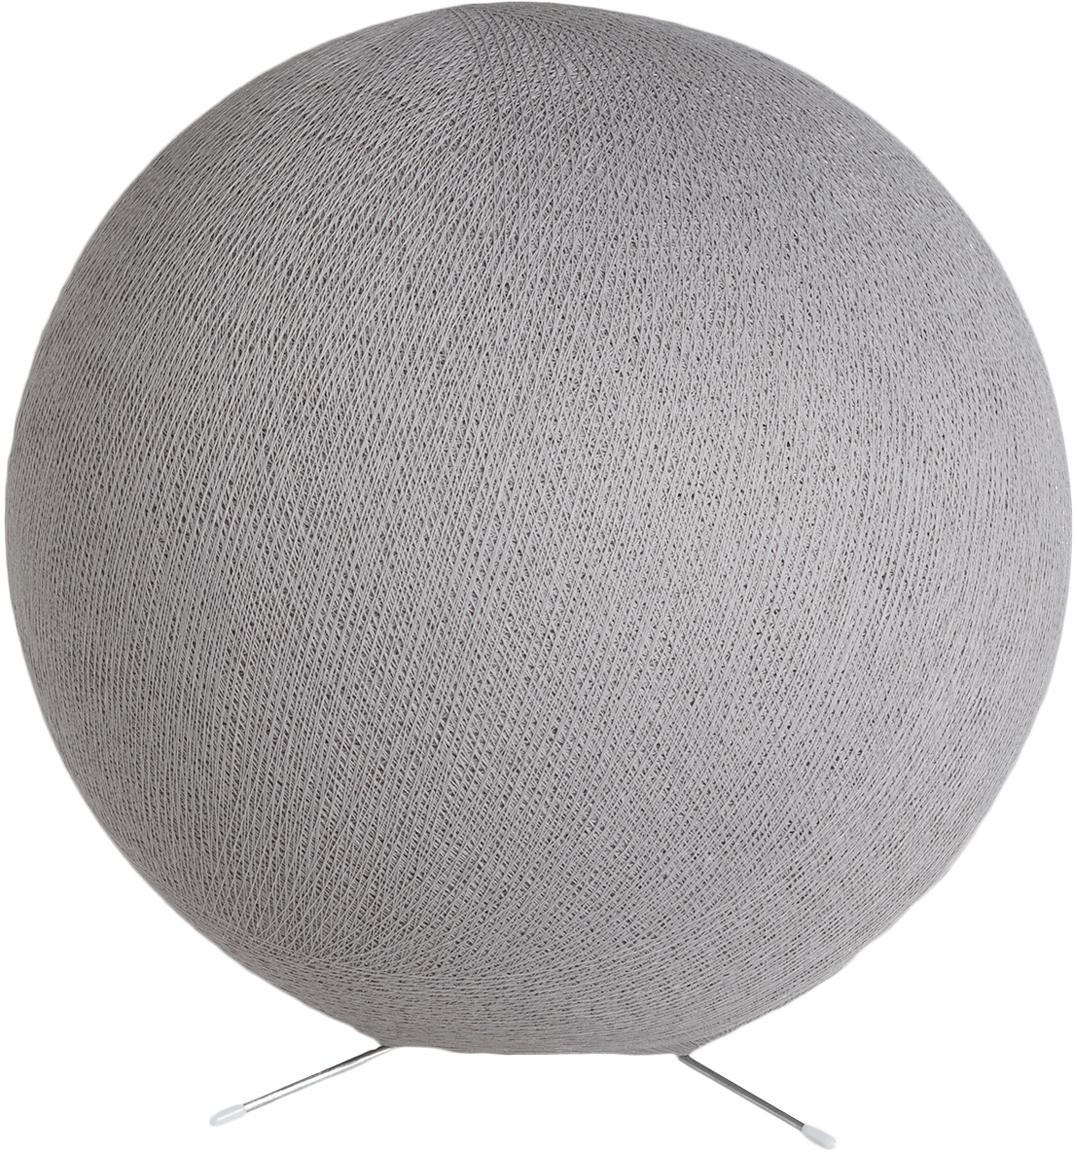 Lámpara de mesa Colorain, Pantalla: poliéster, Base de la lámpara: metal, Cable: plástico, Gris, Ø 36 cm